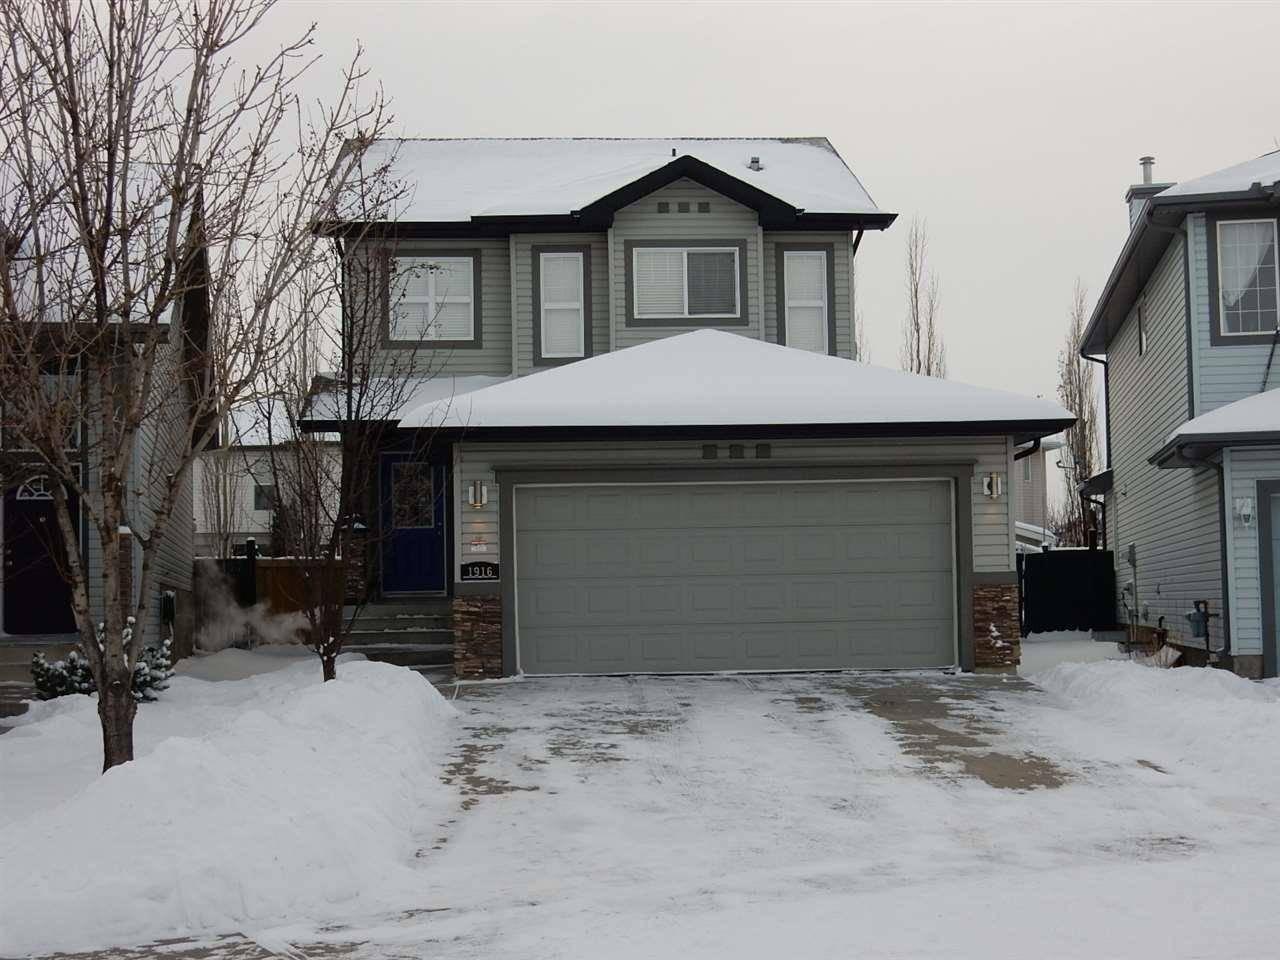 House for sale at 1916 Garnett Wy Nw Edmonton Alberta - MLS: E4186663